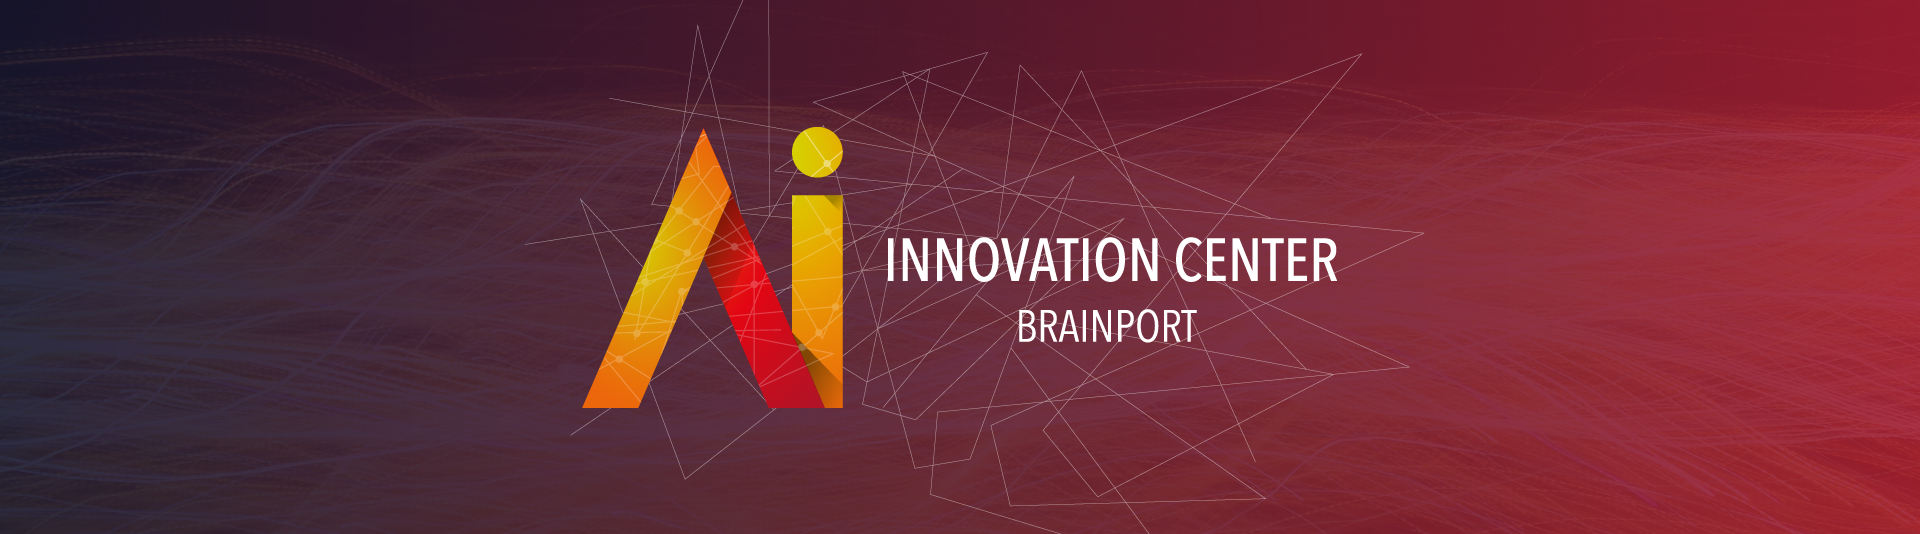 AI Innovation Center_keyvisuallight-1